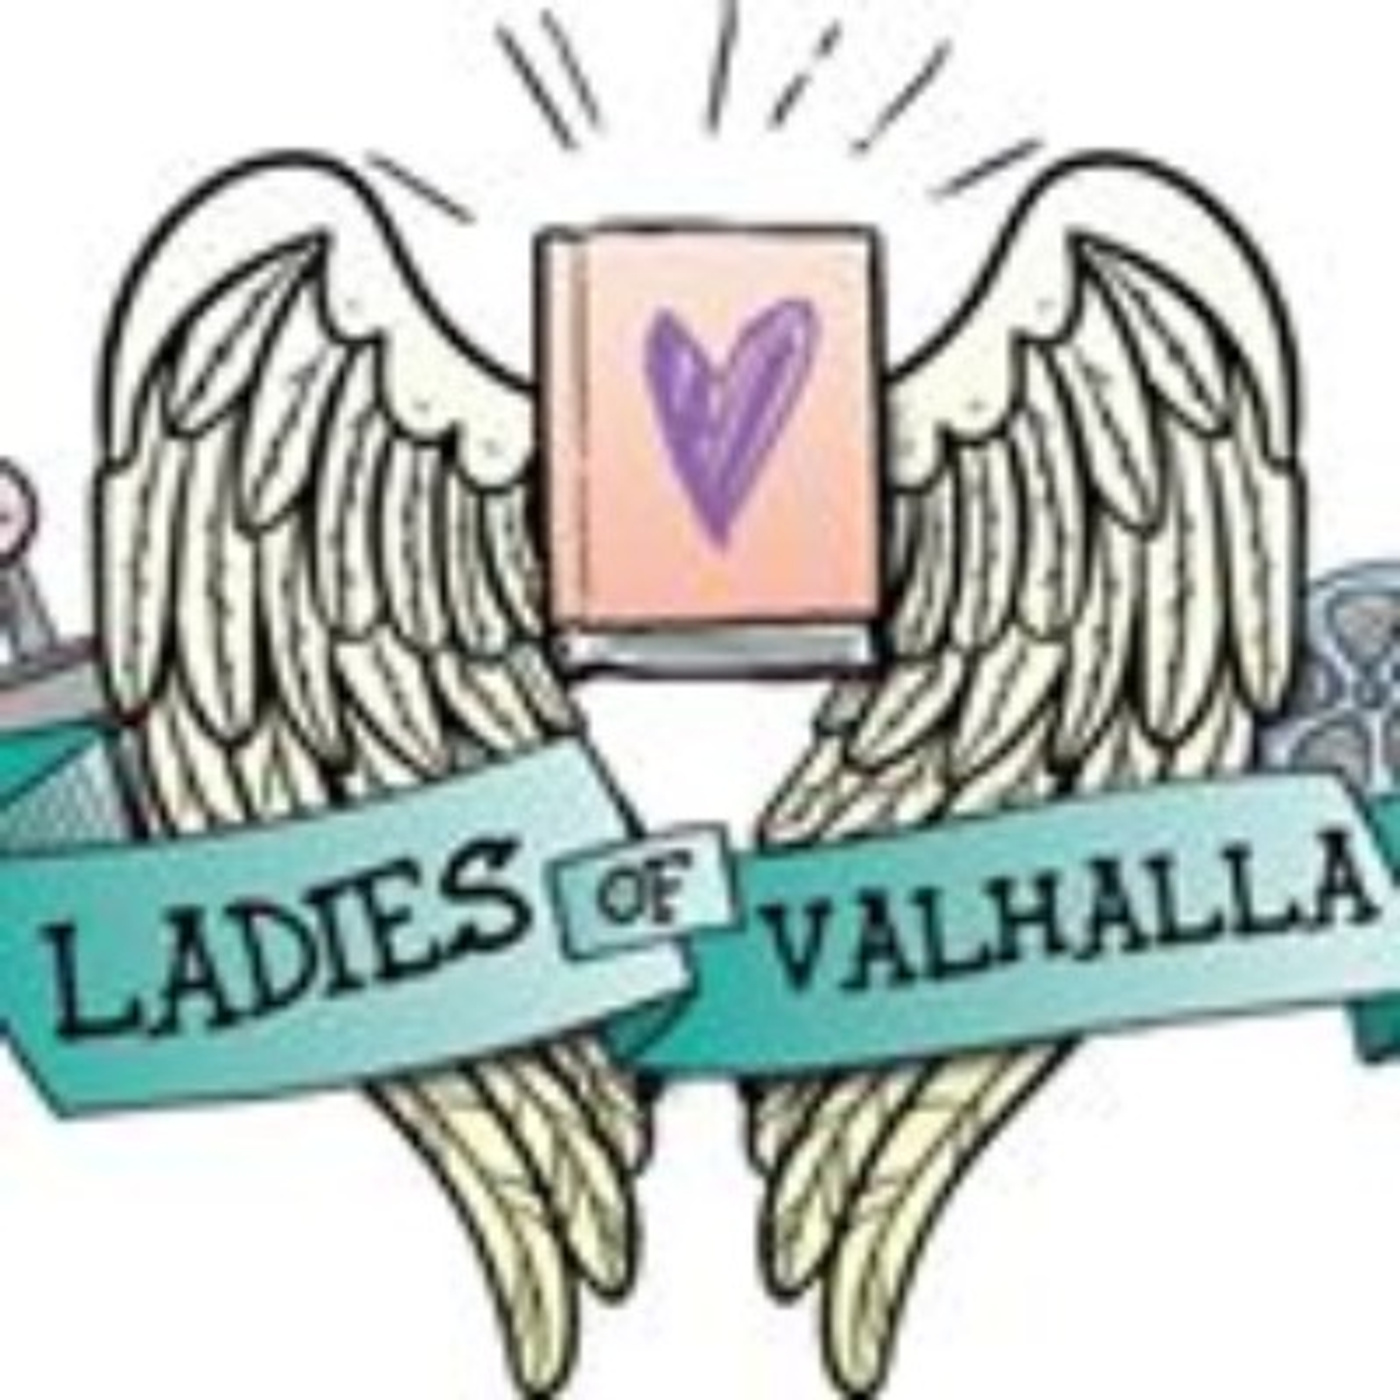 Ladies of Valhalla l Danielle Trussoni, The Ancestor and Crypto-Z